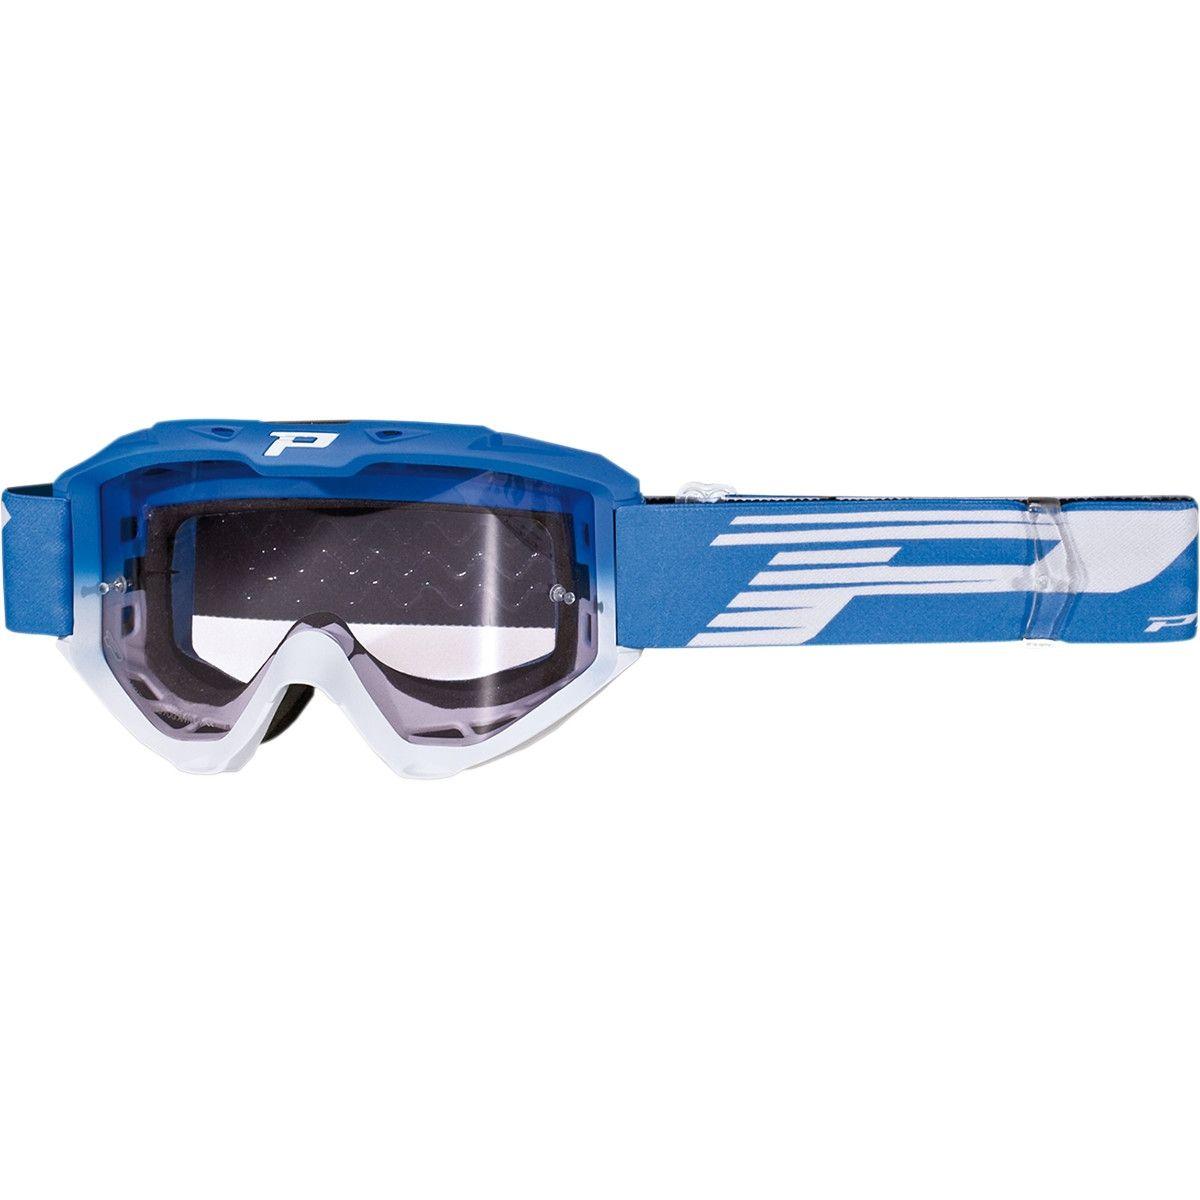 Progrip Crossbril 3450 Light Sensitive Riot Blue/White